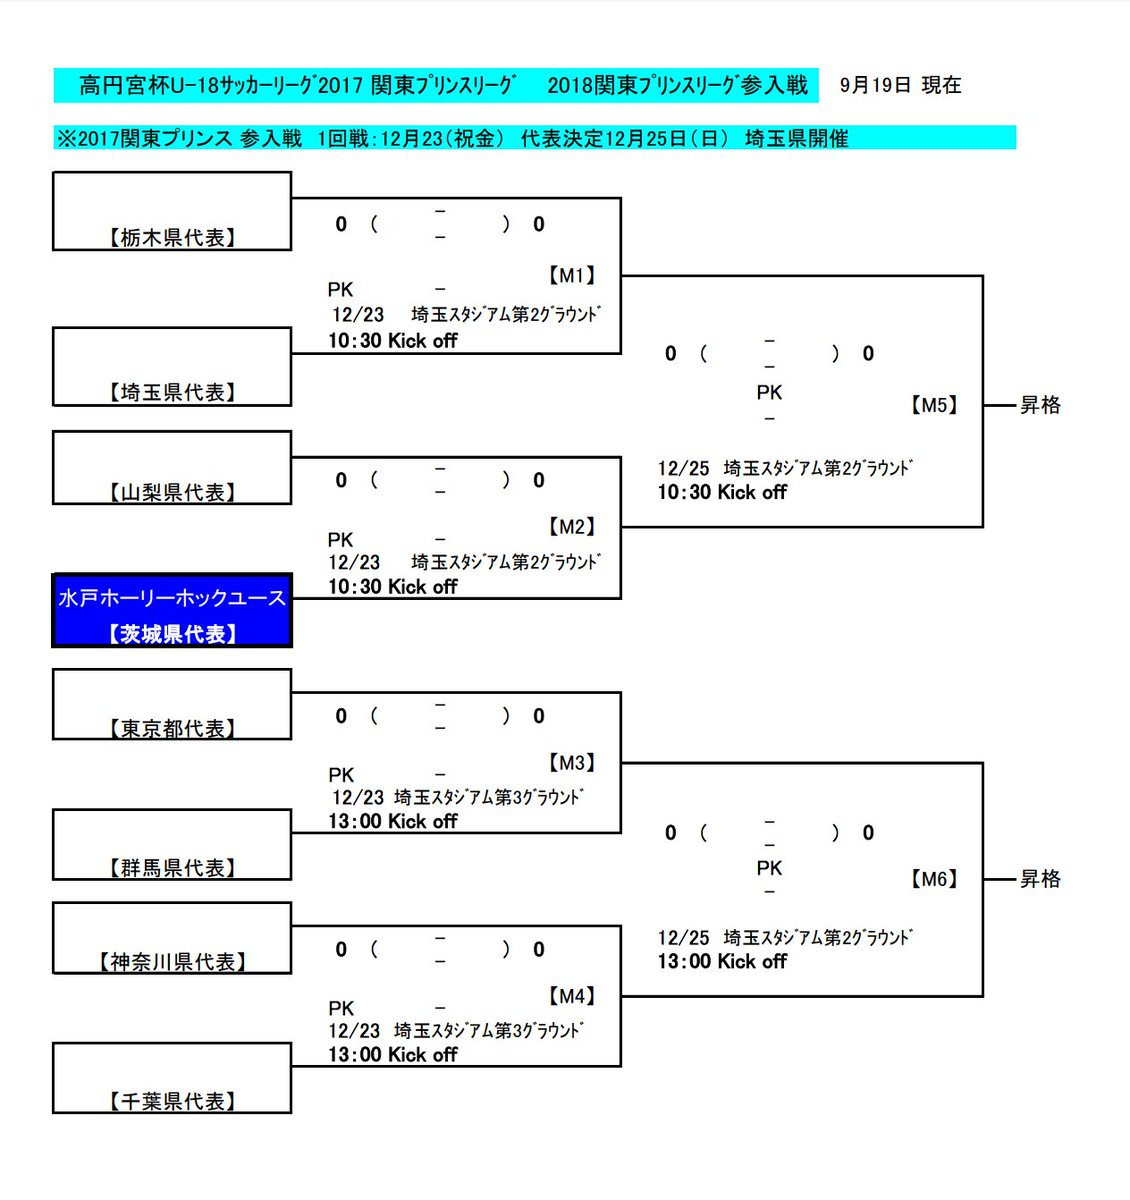 test ツイッターメディア - プリンスリーグ関東参入戦の出場チーム、栃木県代表が矢板中央に、埼玉県代表が昌平に決定した模様。どちらも全国高校サッカー選手権出場チーム。  水戸ユースが1回戦で対戦する山梨県代表は来週の最終節まで持ち越しの模様。 https://t.co/wbq19ummcS